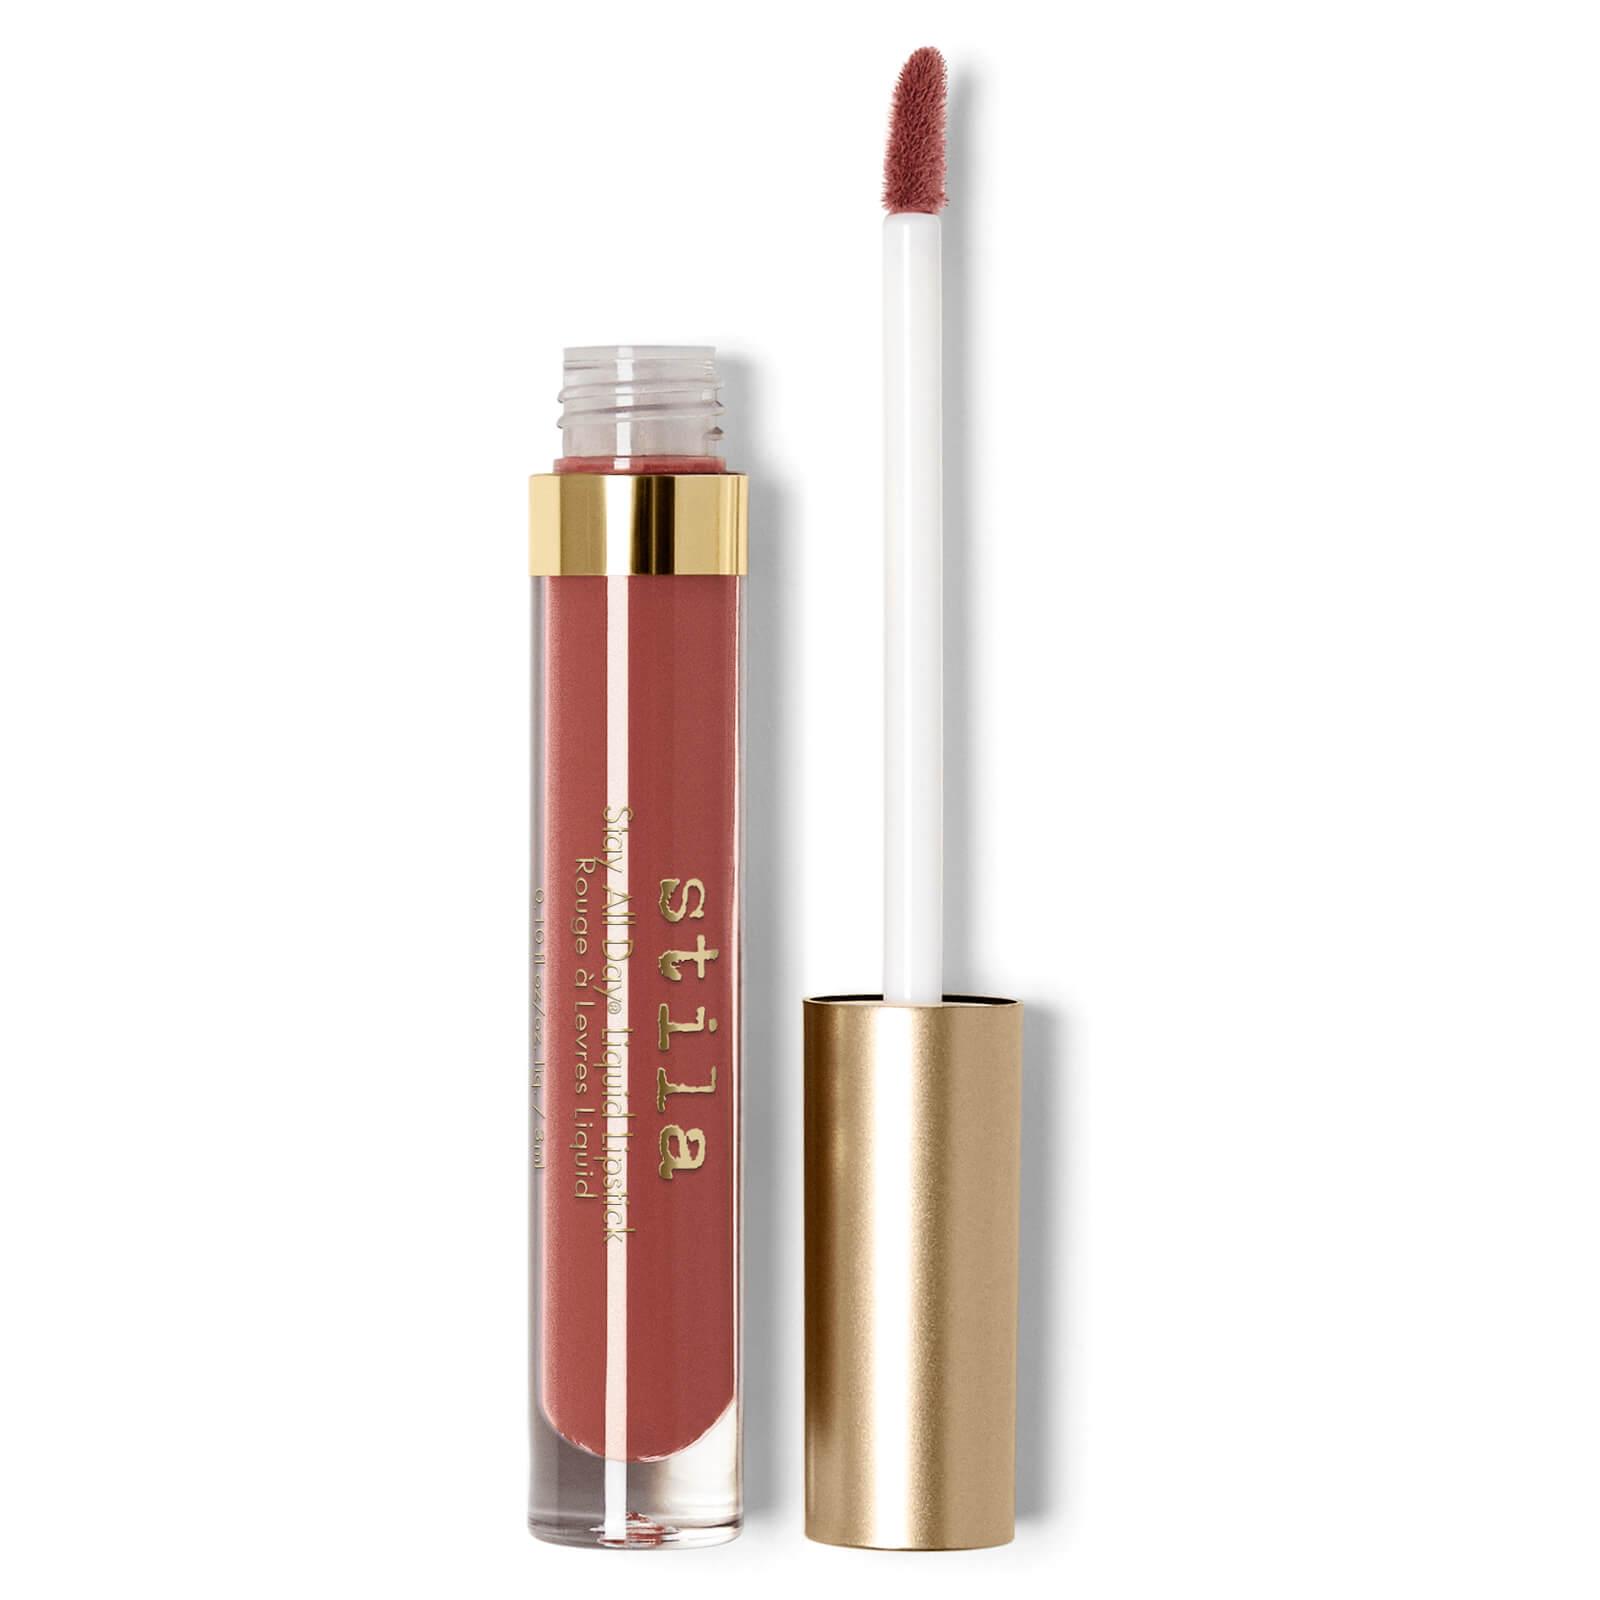 Stila Stay All Day Liquid Lipstick (Various Shades) - Siena